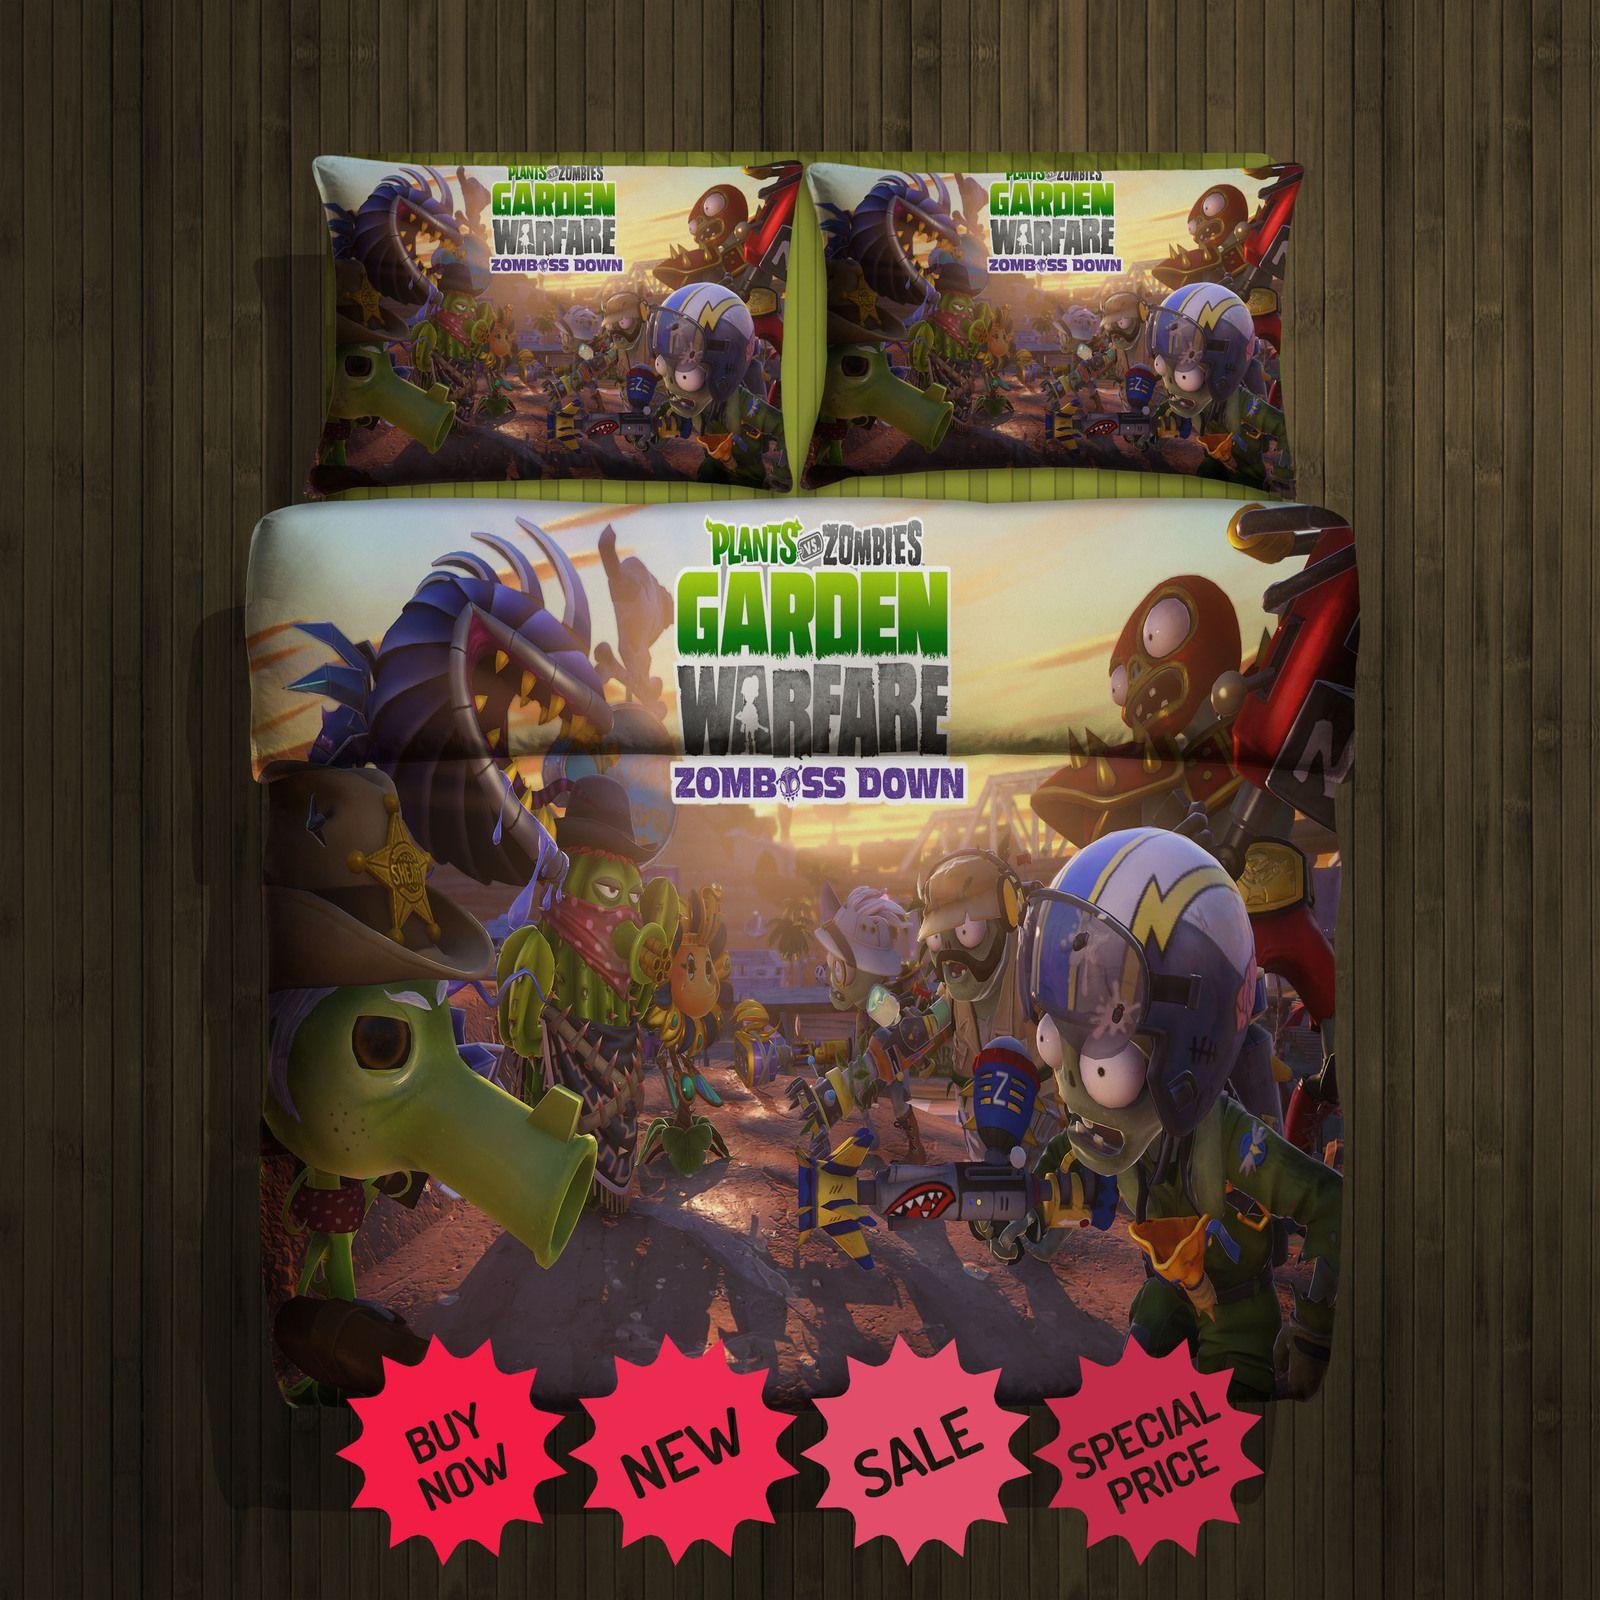 Plants Vs Zombies Blanket Large 2 Pillow Cases #94732217,94732218(2 ...